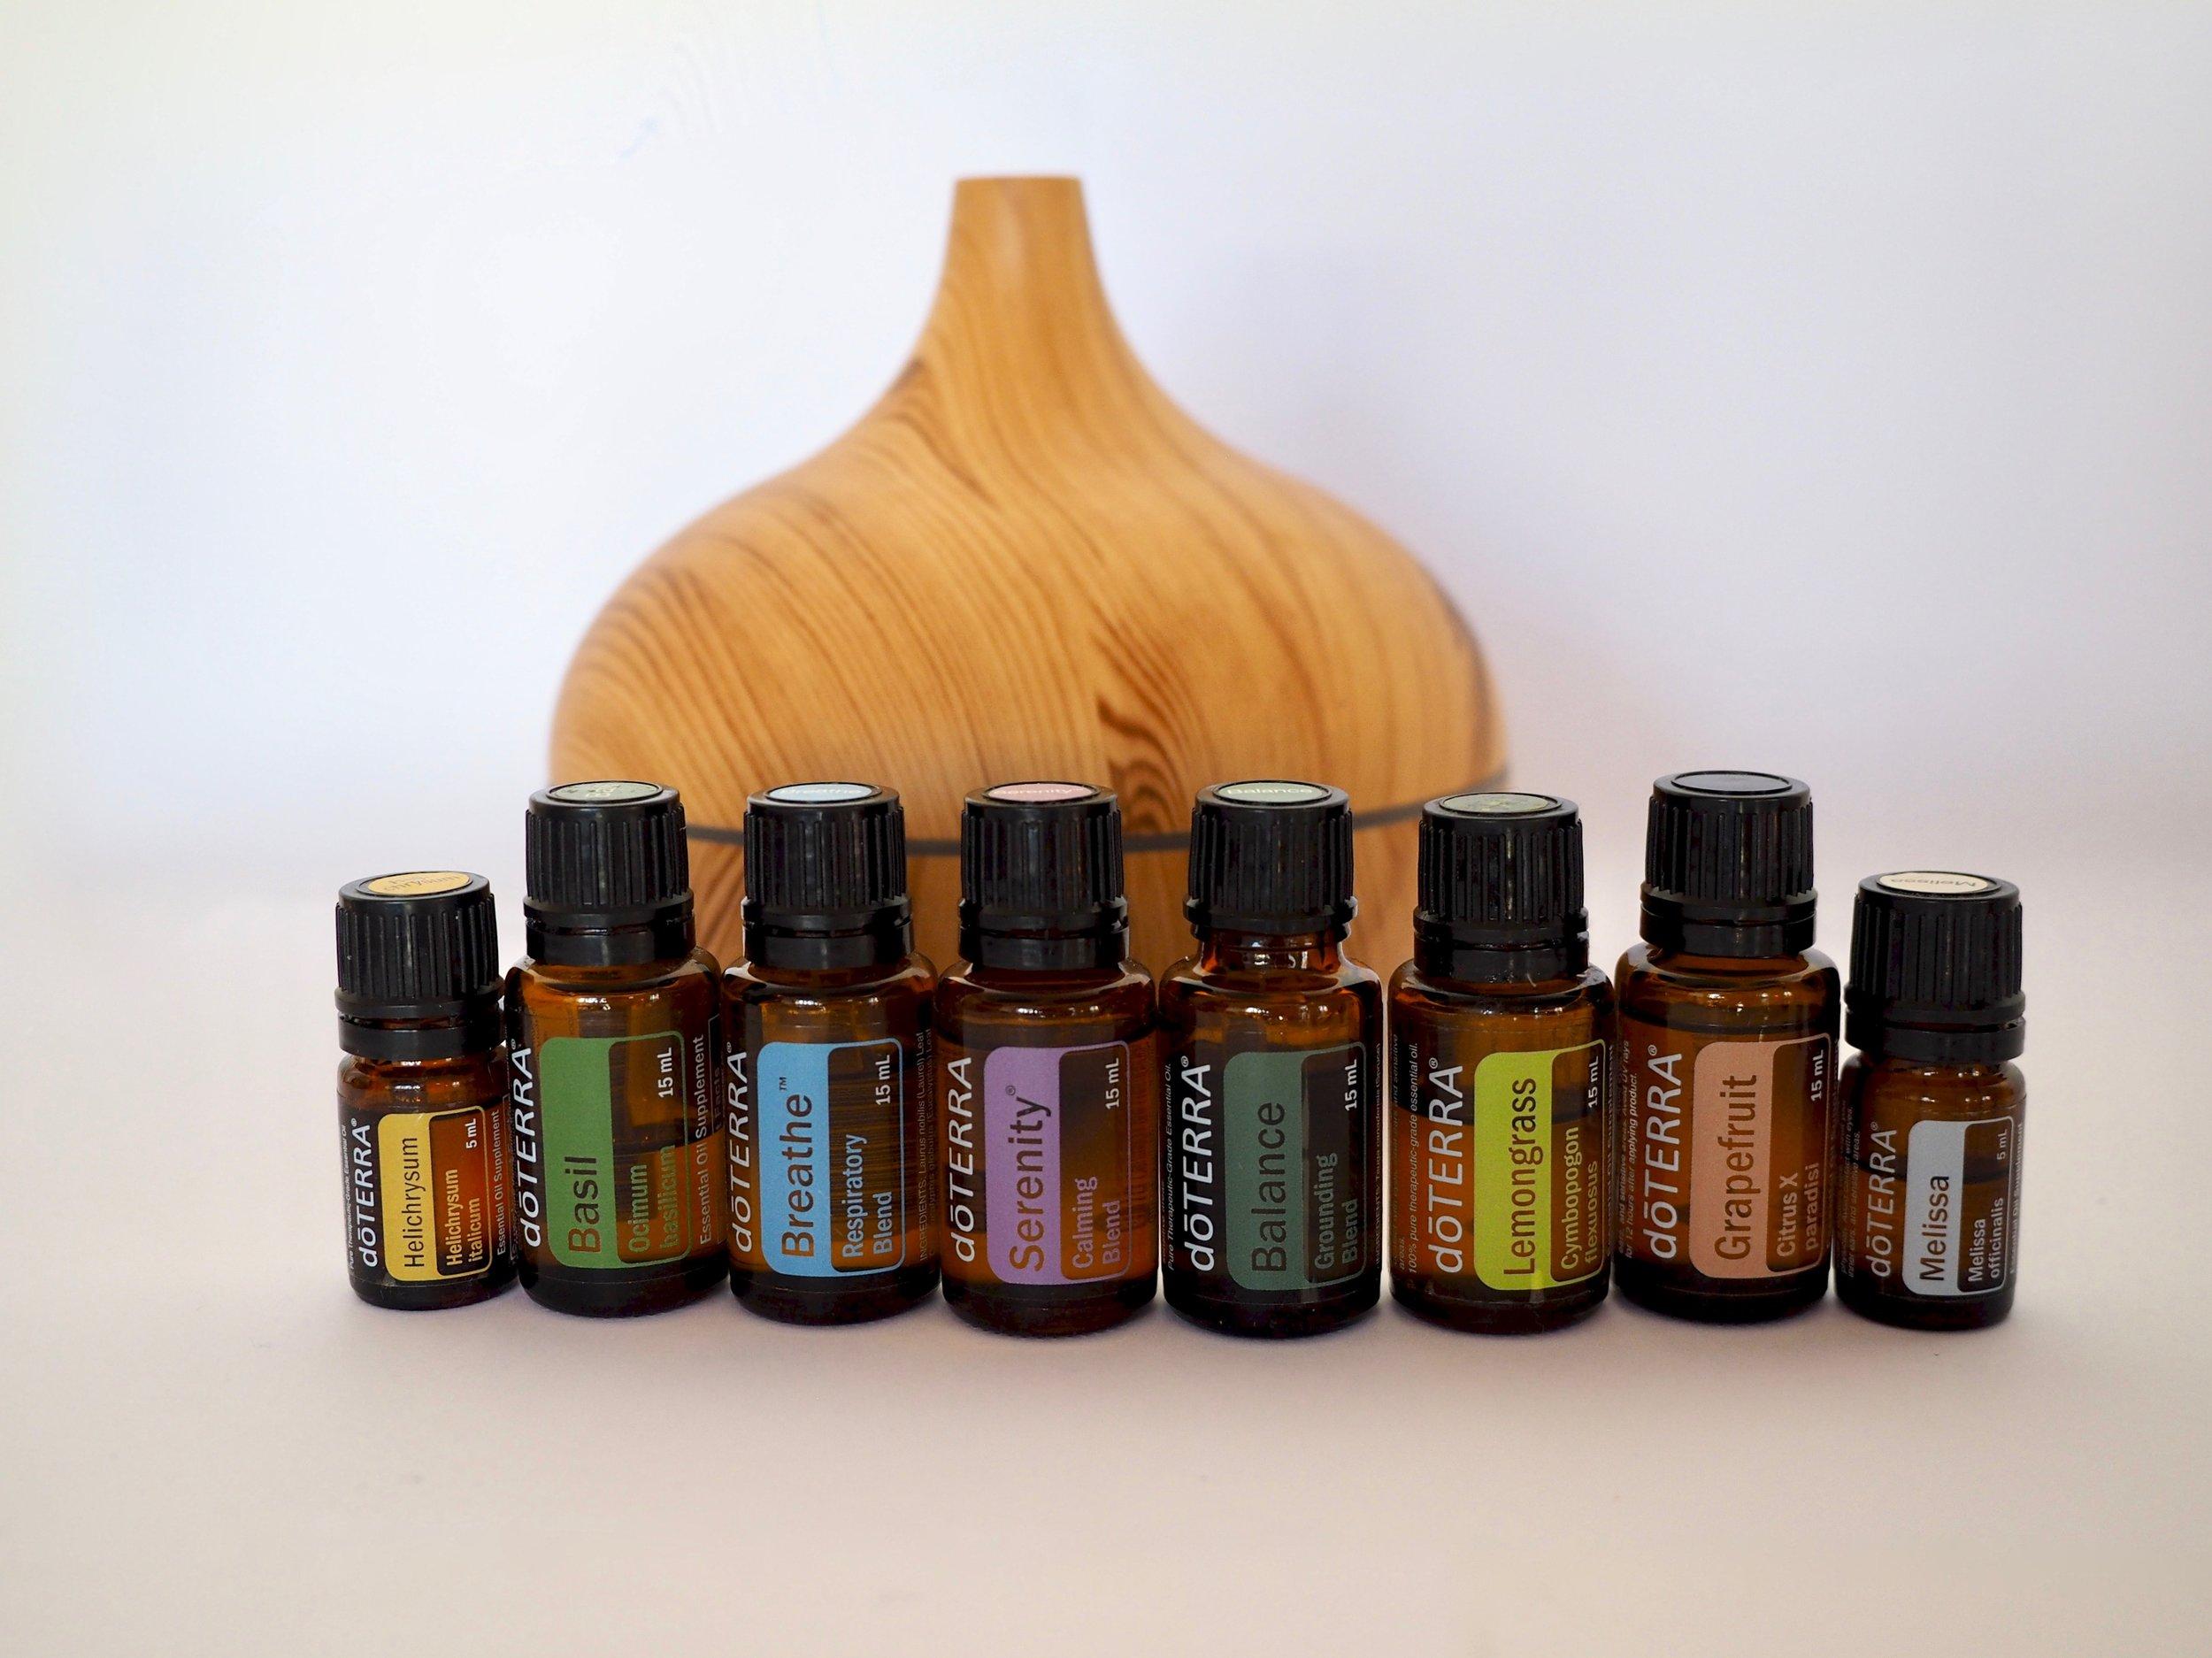 doTerra essential oils for enhanced sessions